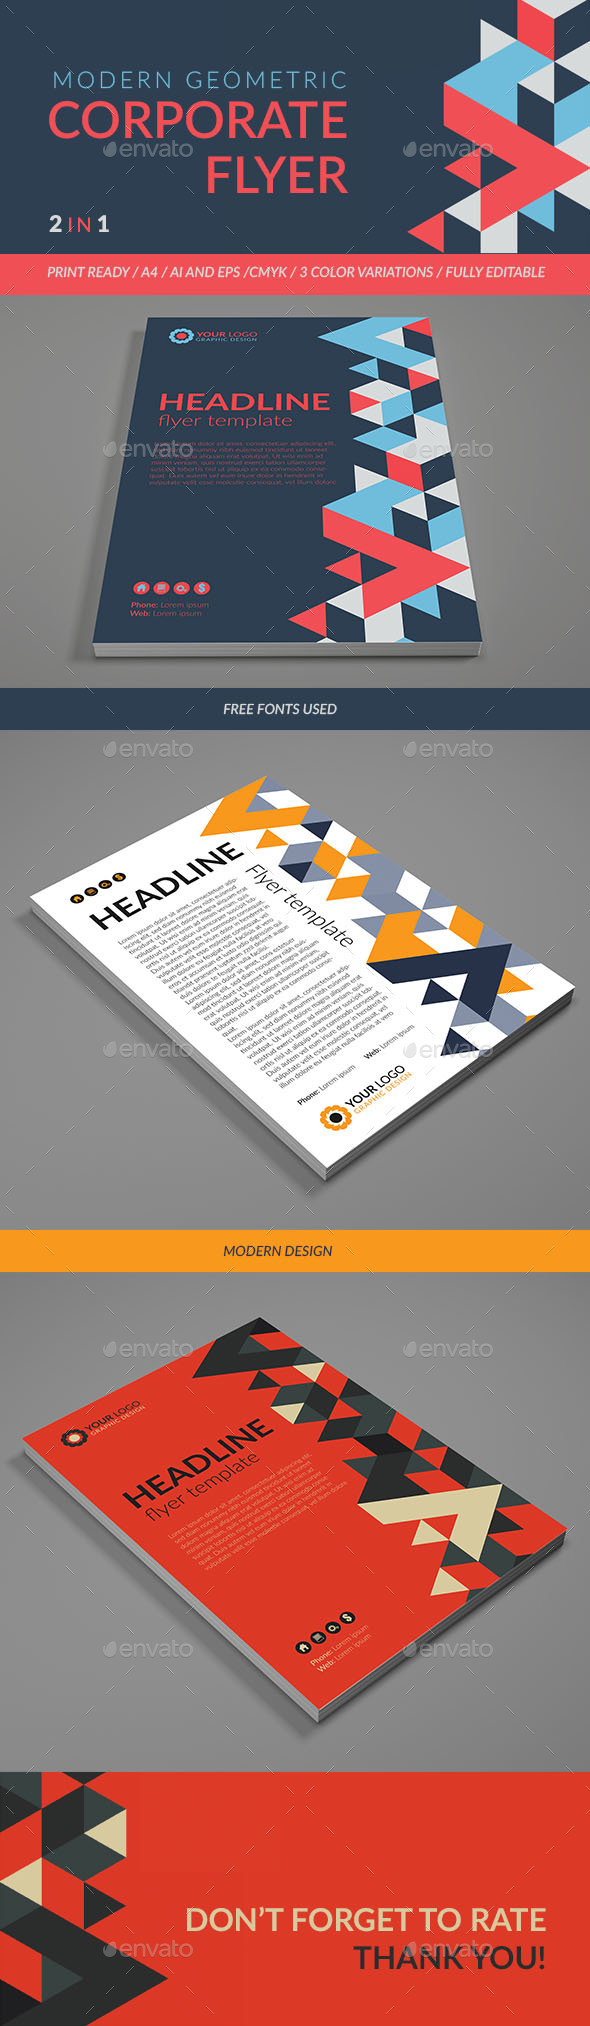 Modern Geometric Corporate Flyer. - Flyers Print Templates